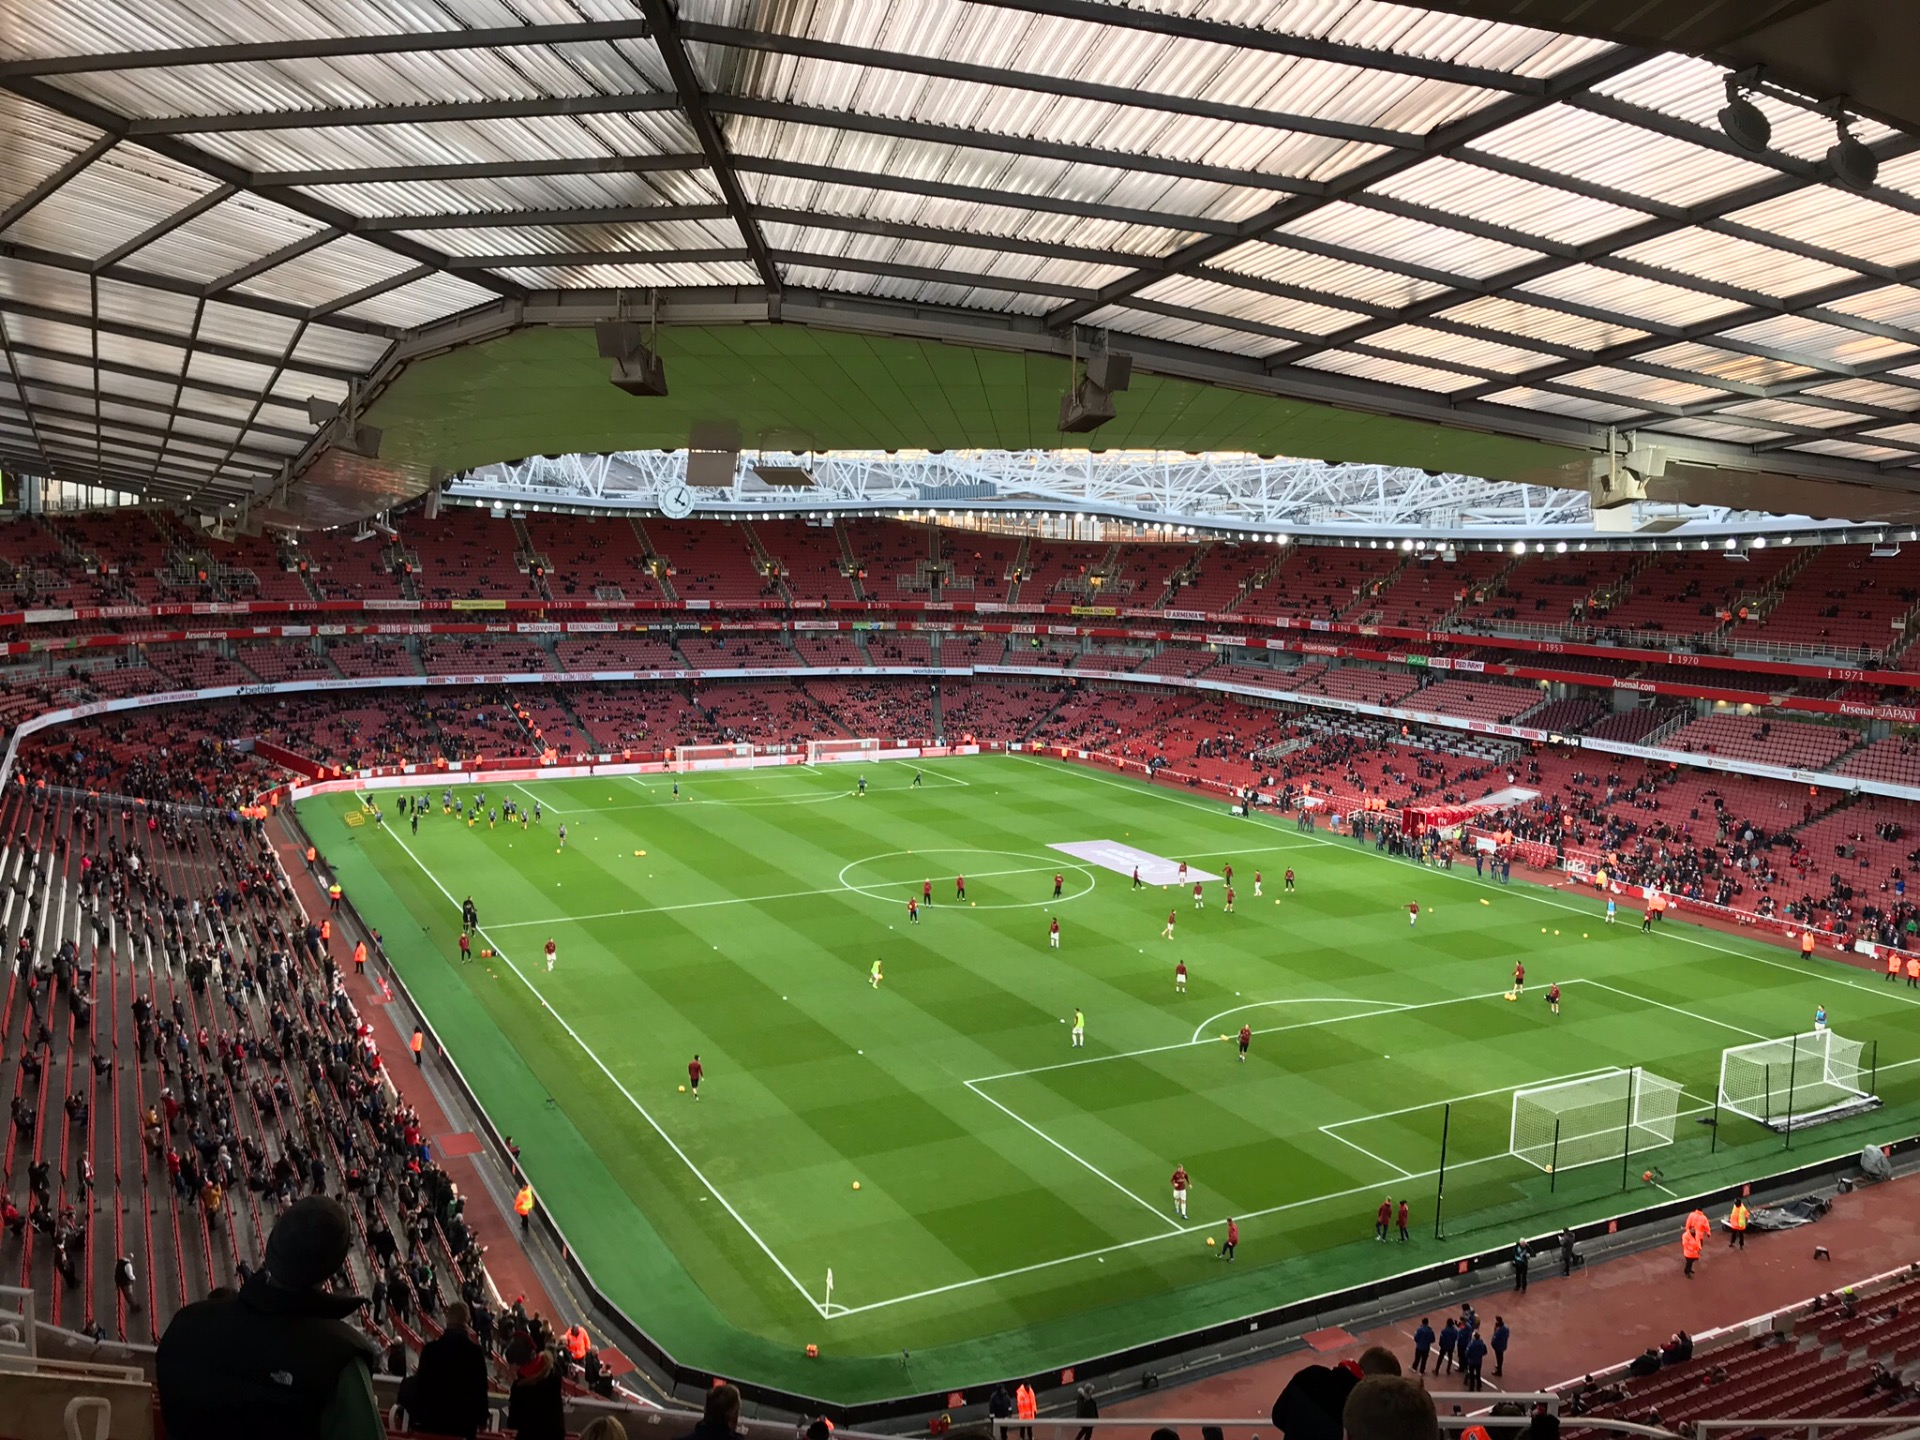 Emirates Stadium Section 105 Row 19 Seat 410